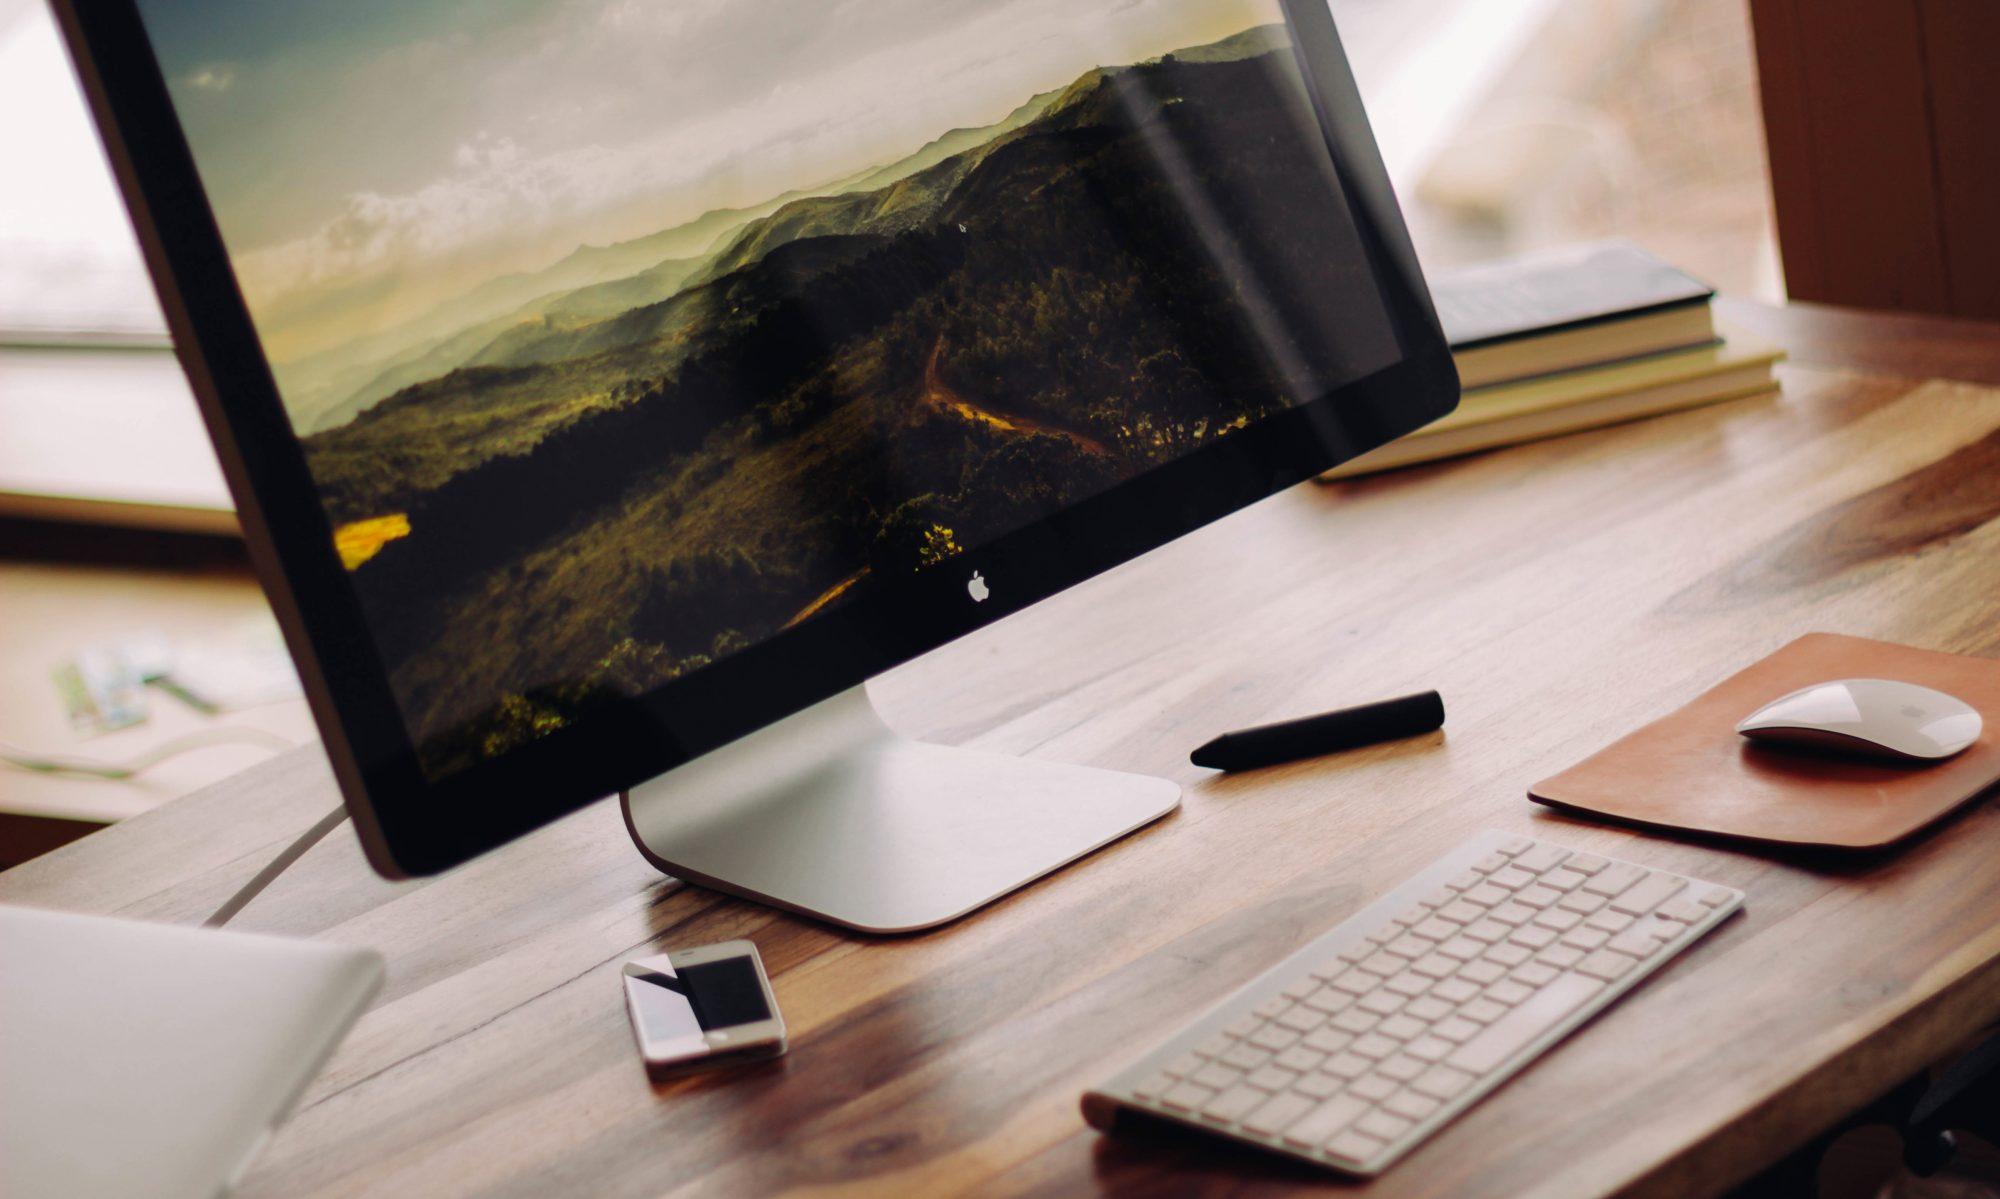 Formby Fones & Computing